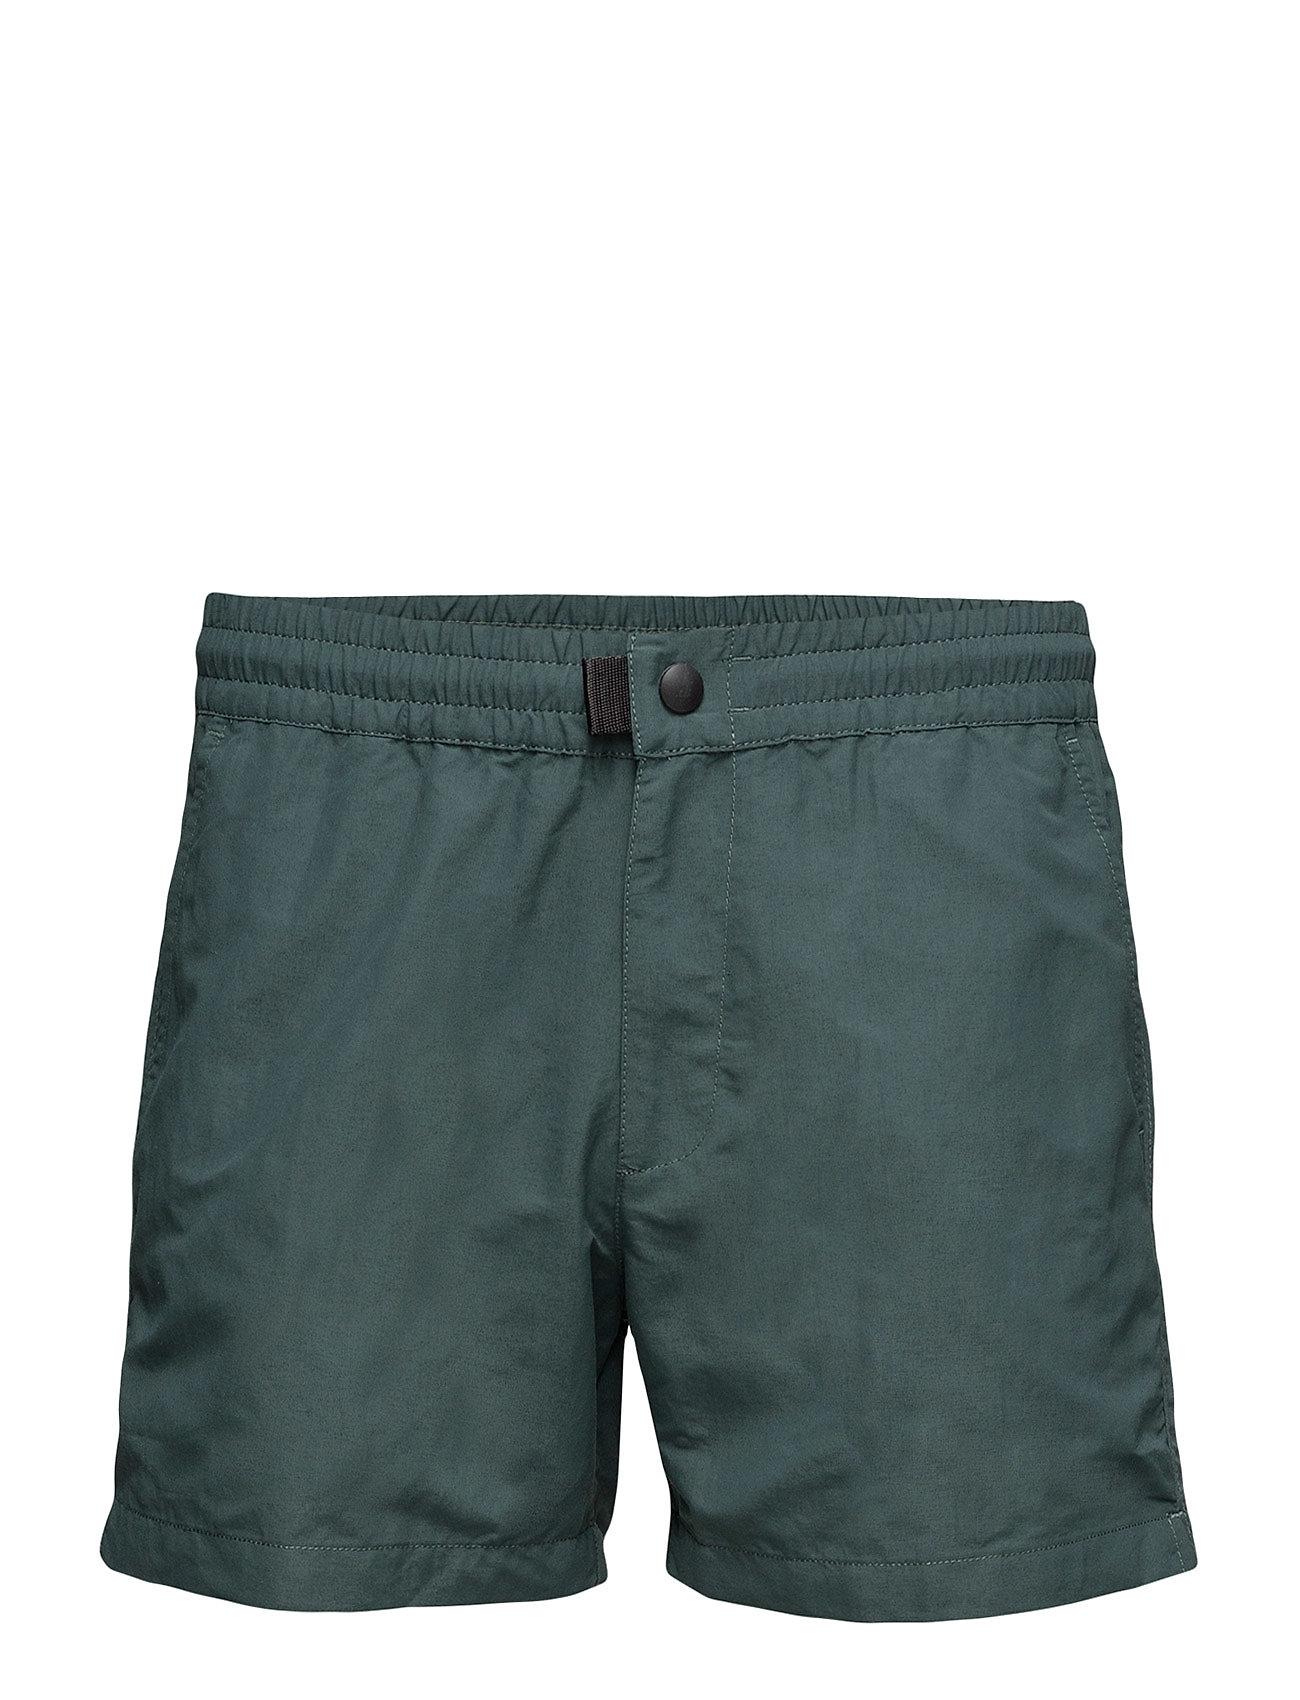 Beach Crawl 17-1 Mads Nørgaard Bermuda Shorts